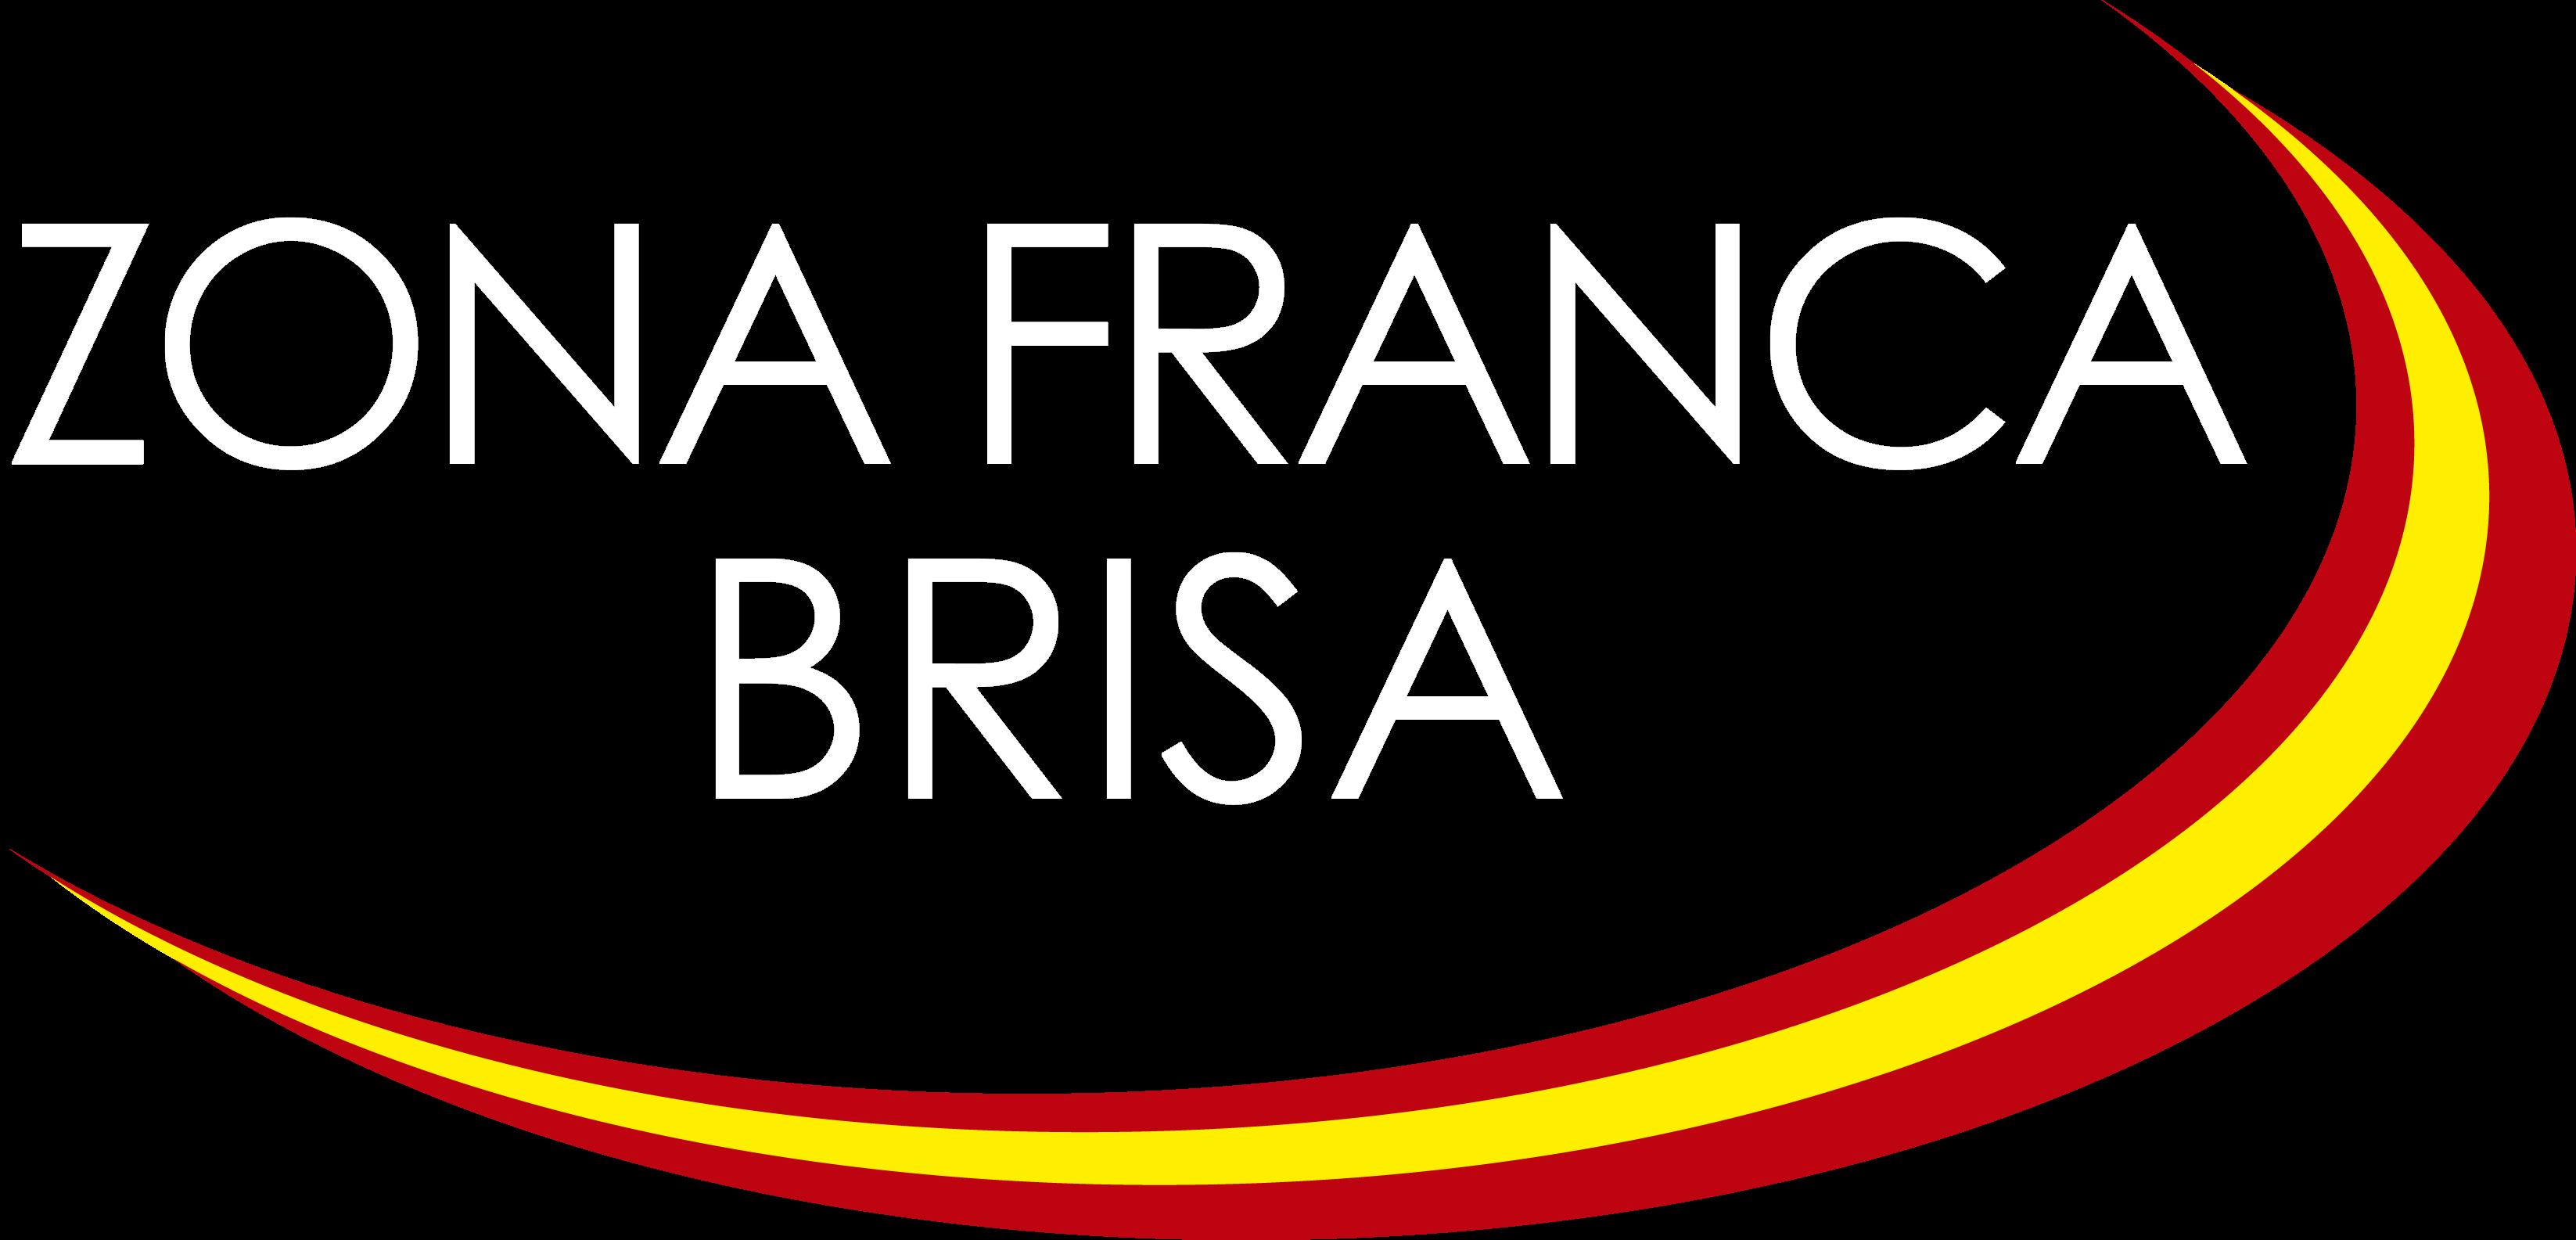 Zona Franca Brisa